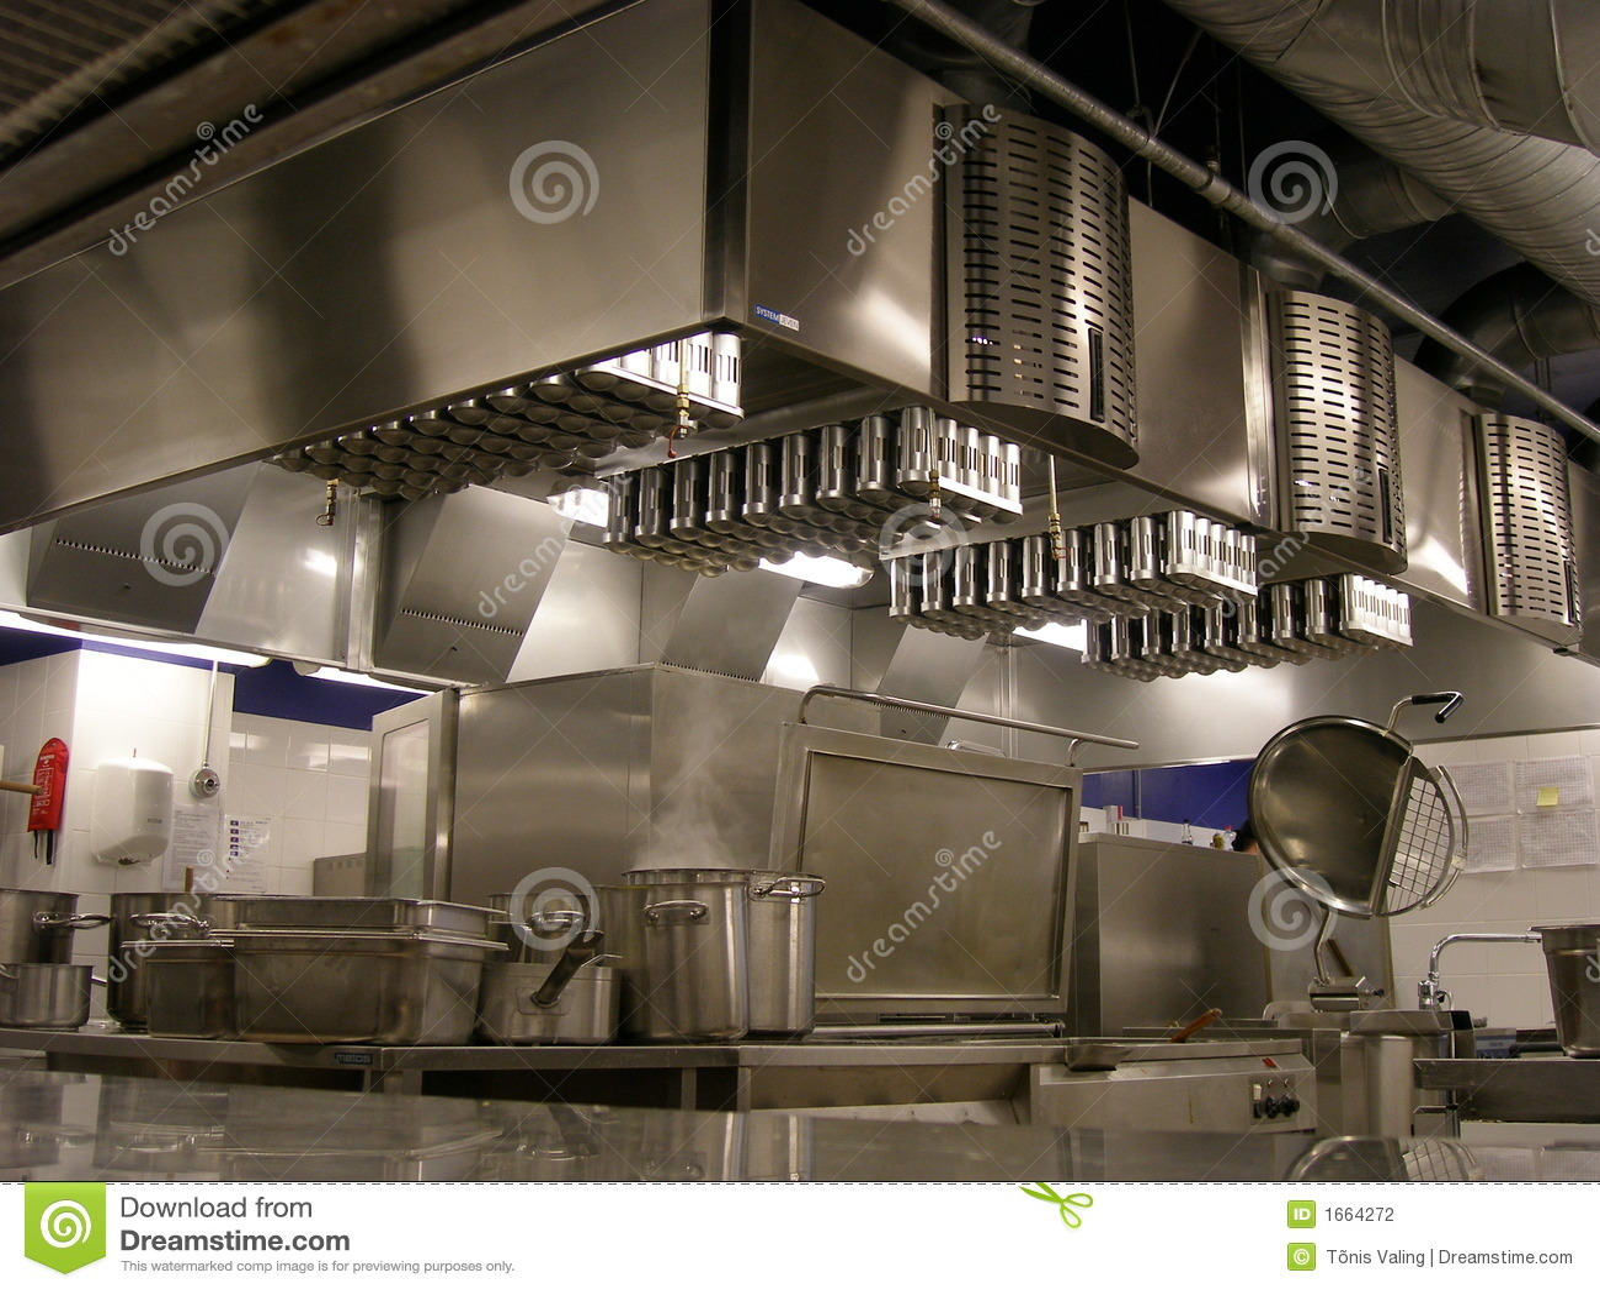 kitchen ventilation fan modern tile restaurant stock photo. image of filters, line ...